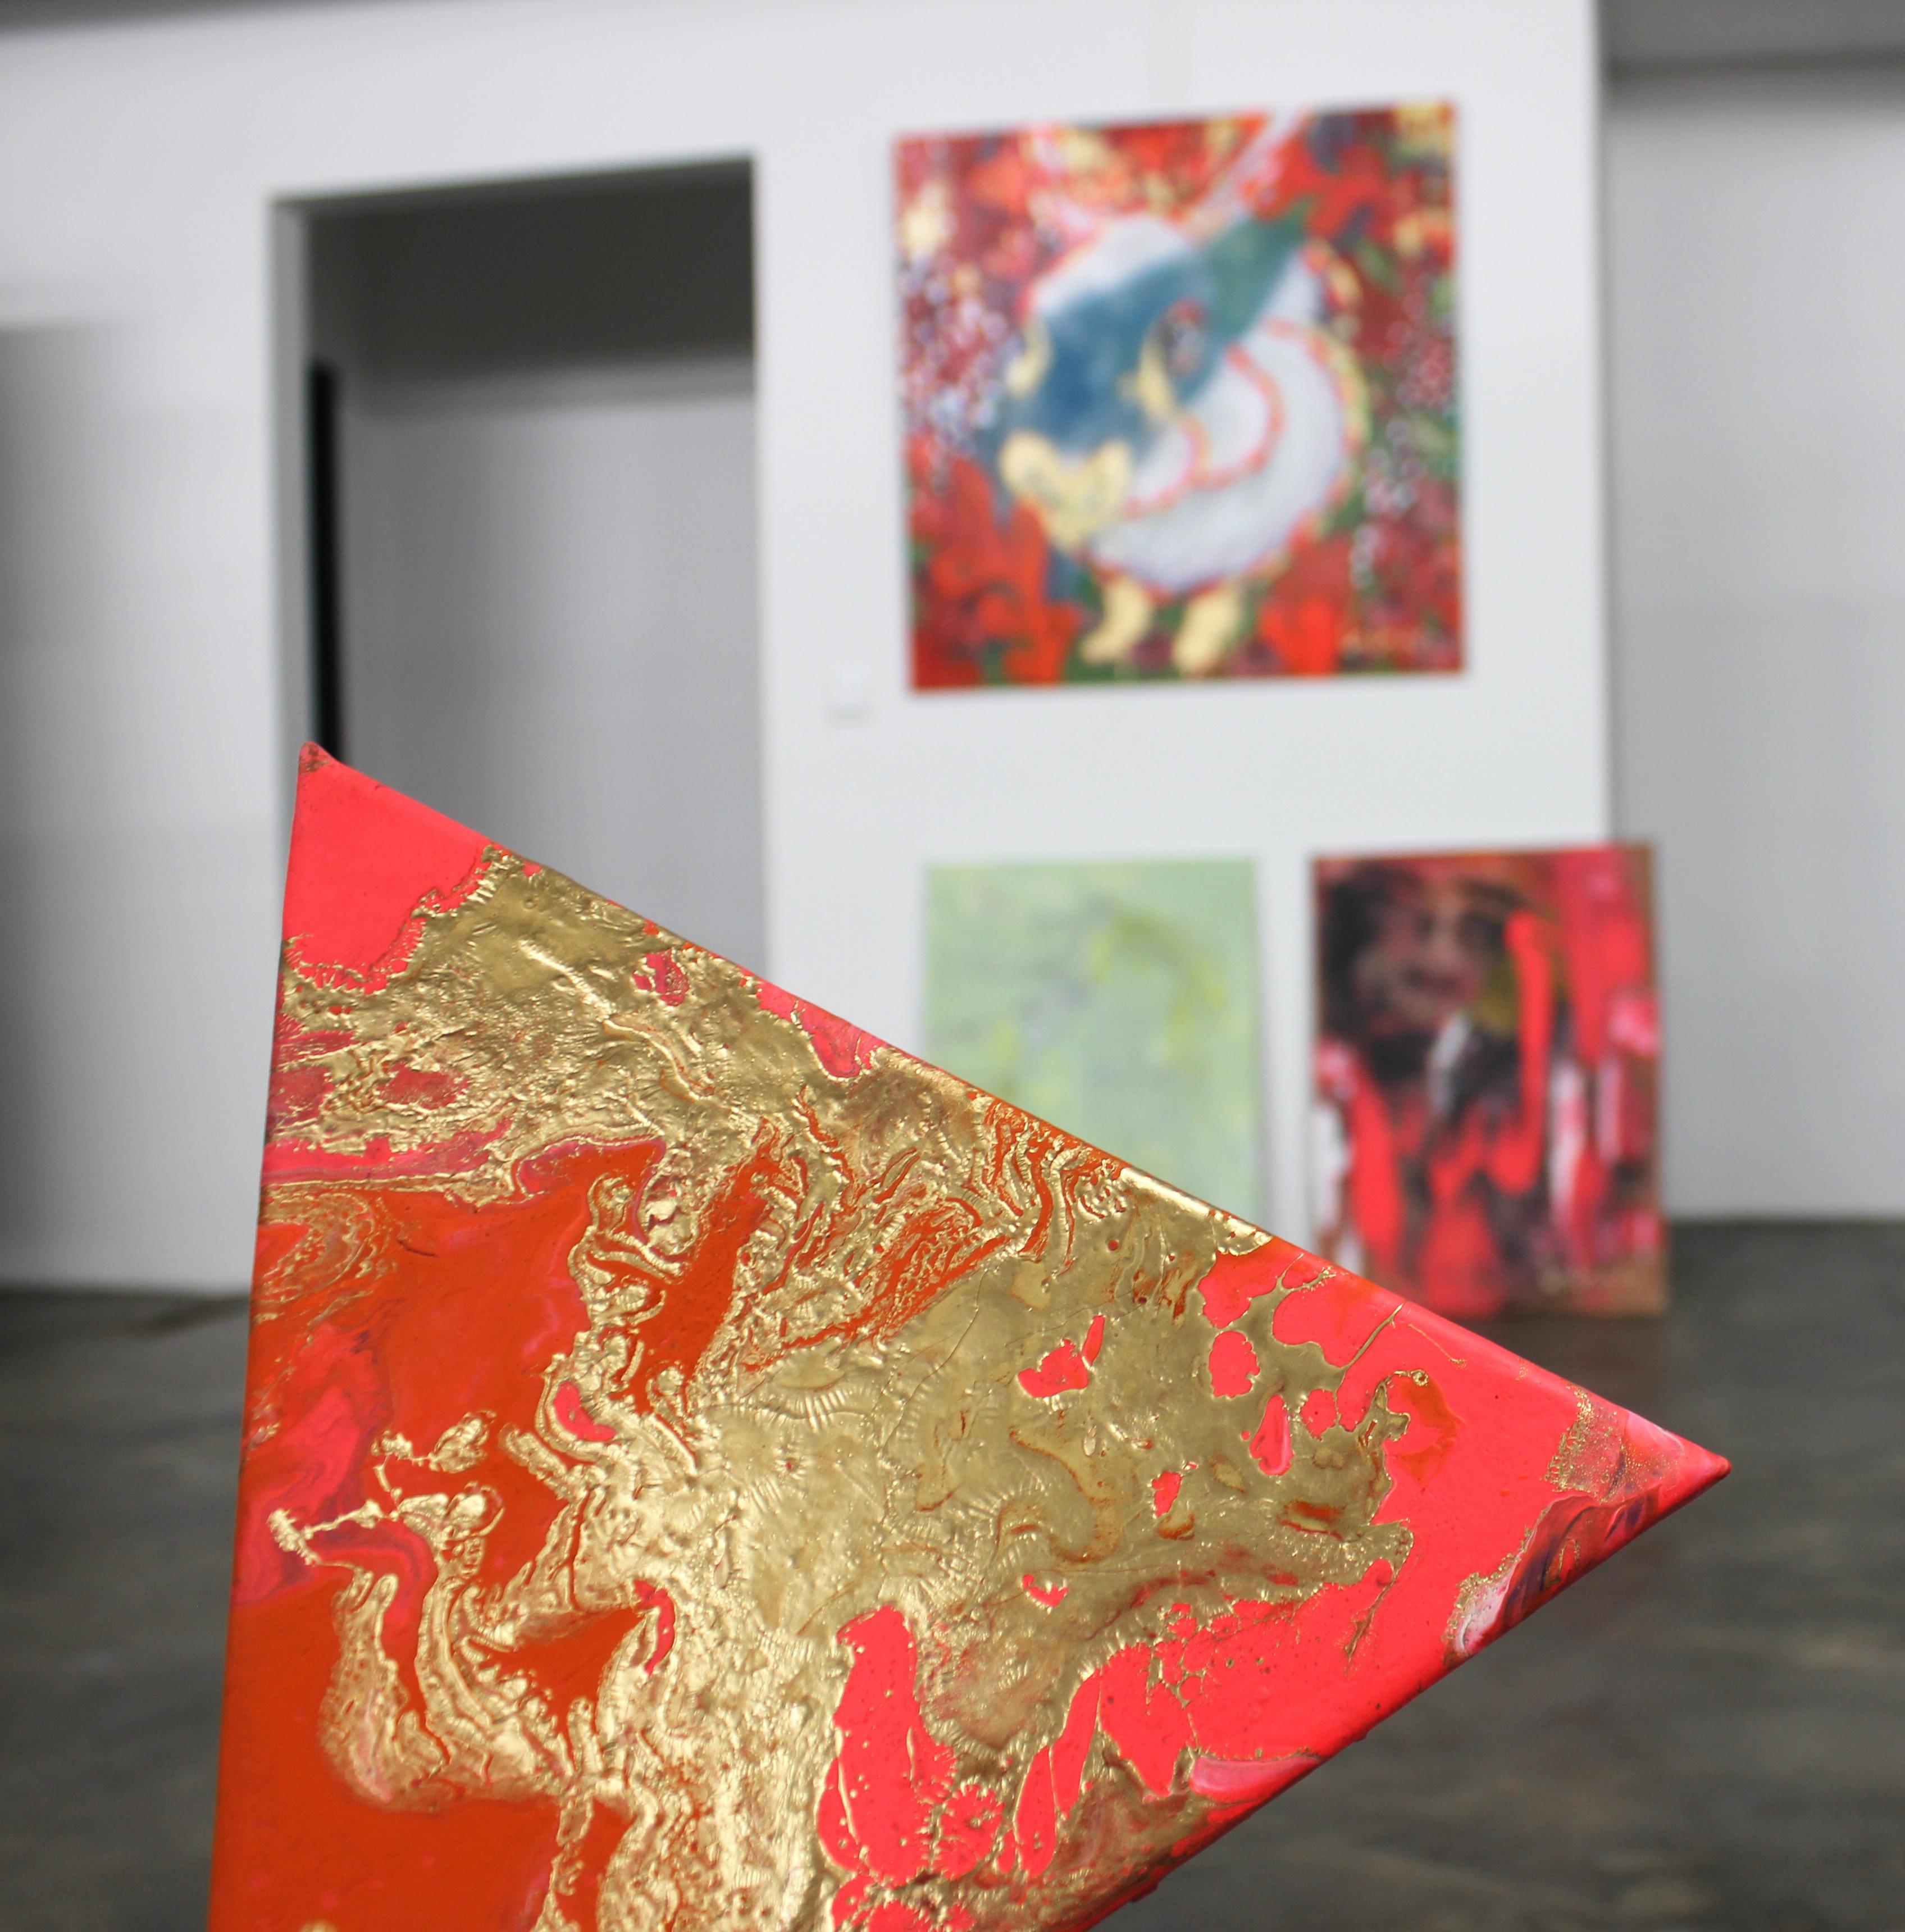 https://www.meier-magazin.de/uploads/1/images/gallery/2020/09/18/annika-bachhofer-zeitgenössische-kunst.JPG